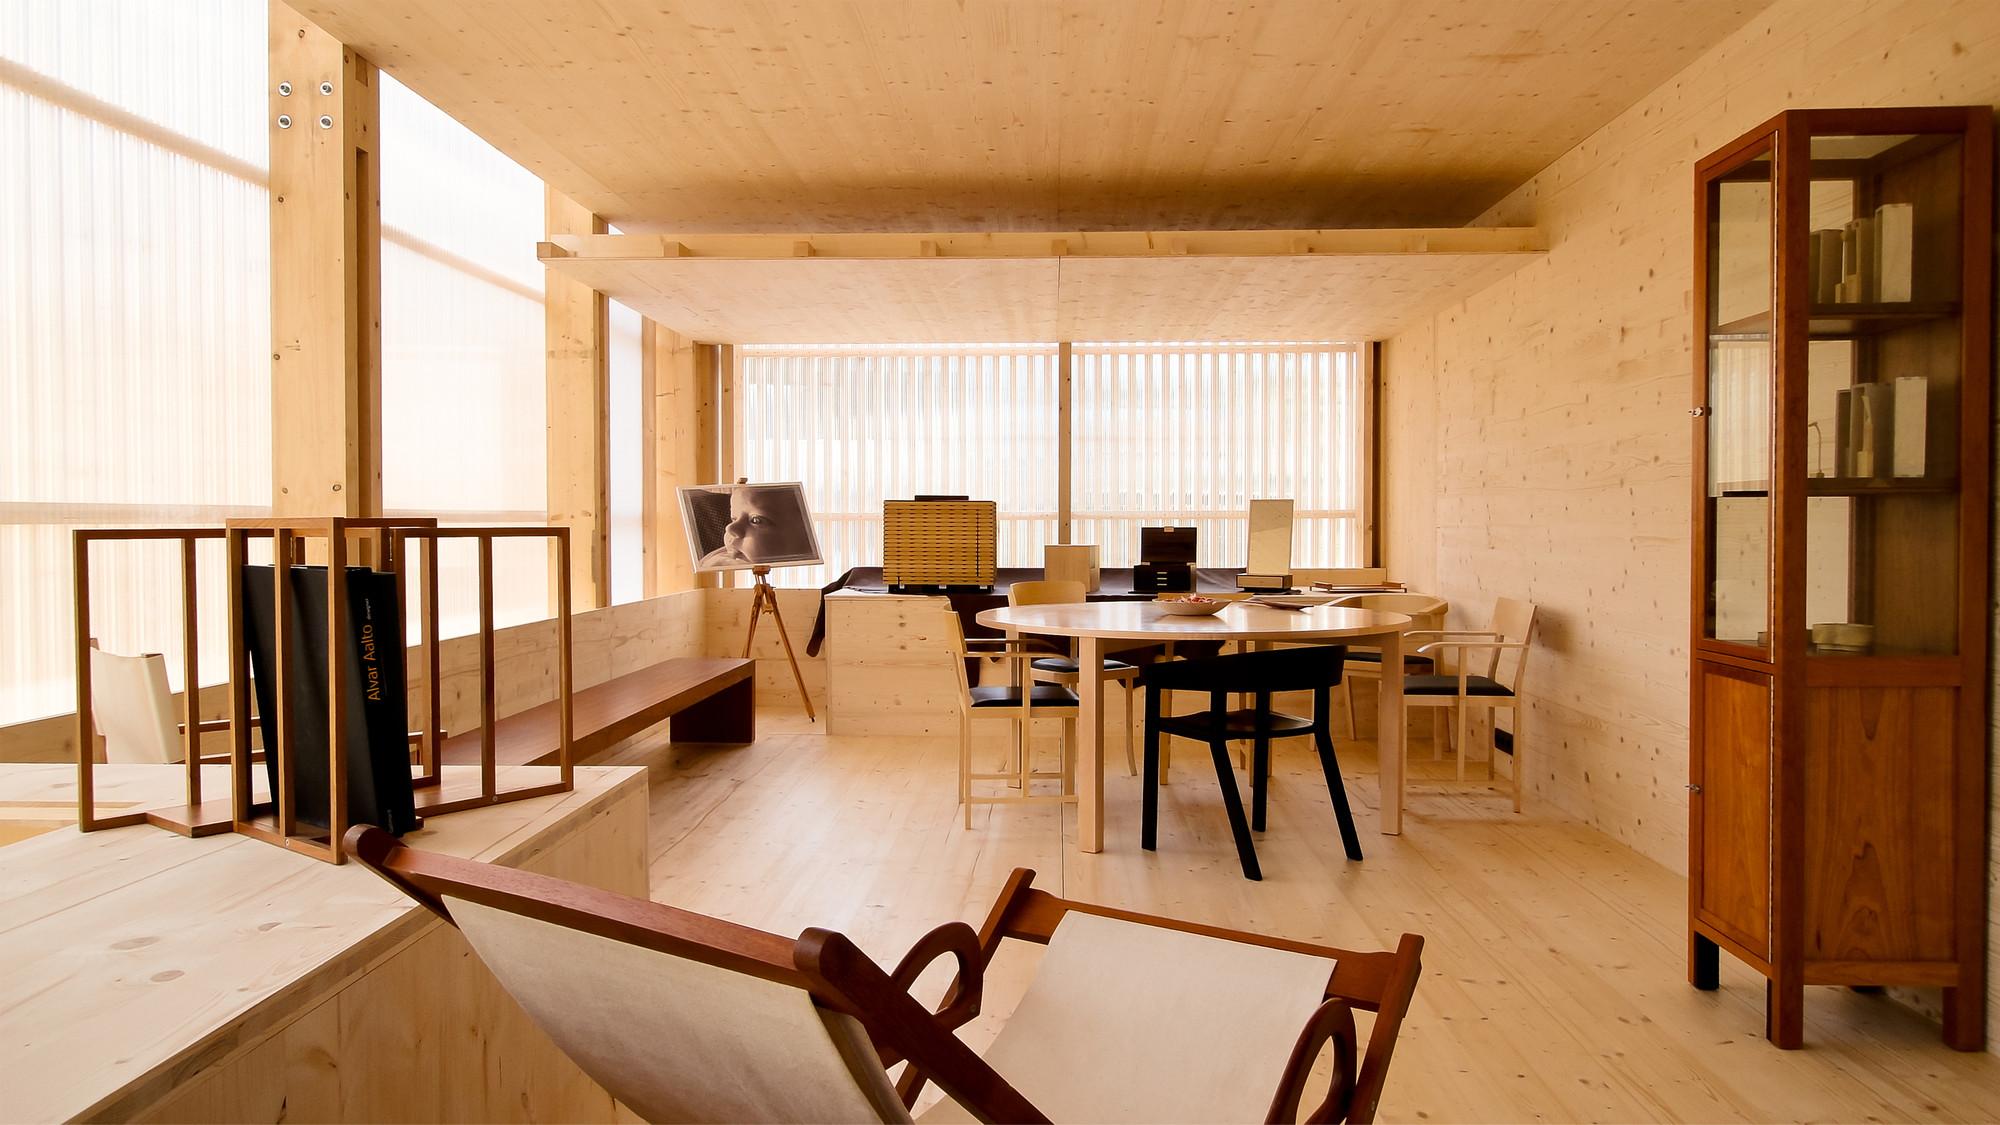 galeria de caixa modular spss design 13. Black Bedroom Furniture Sets. Home Design Ideas